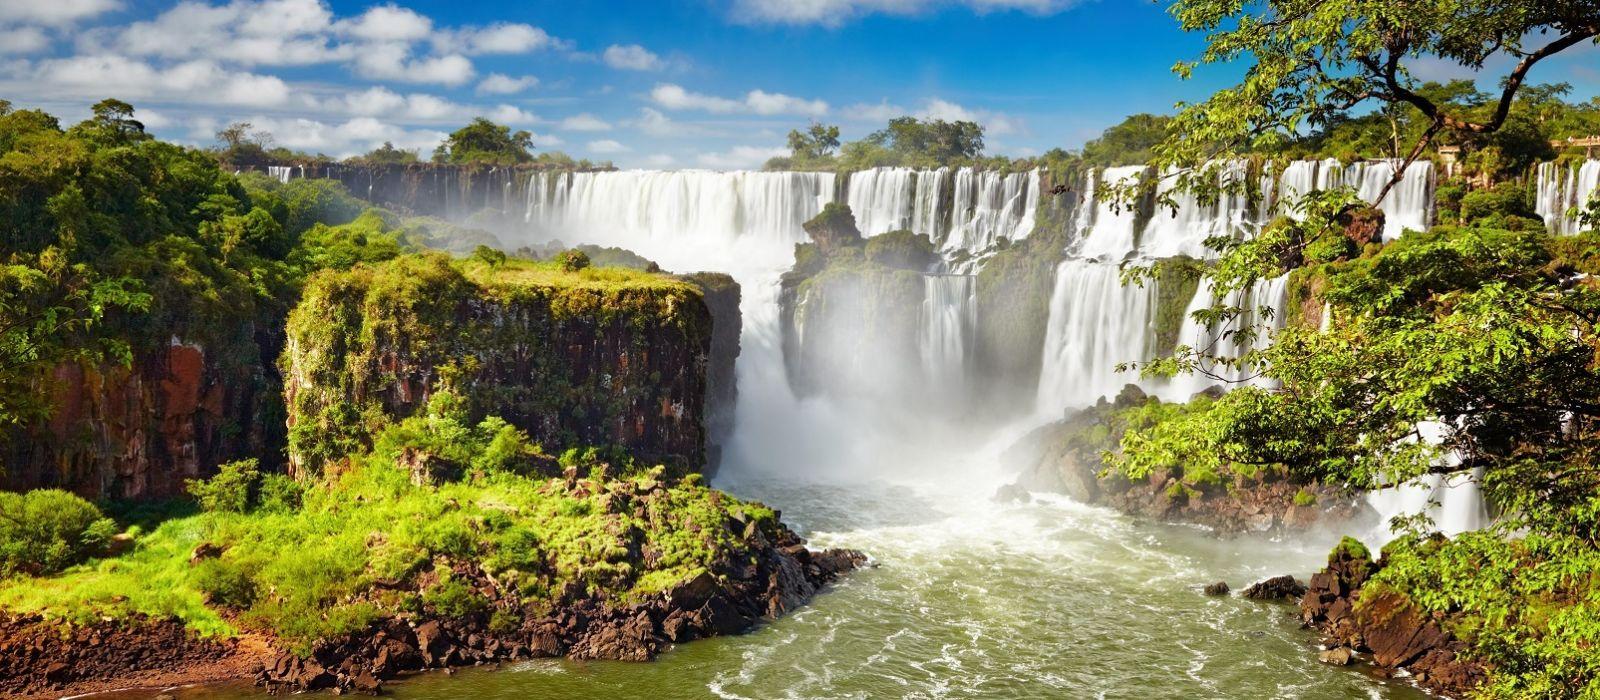 Argentina: Signature Highlights Tour Trip 4